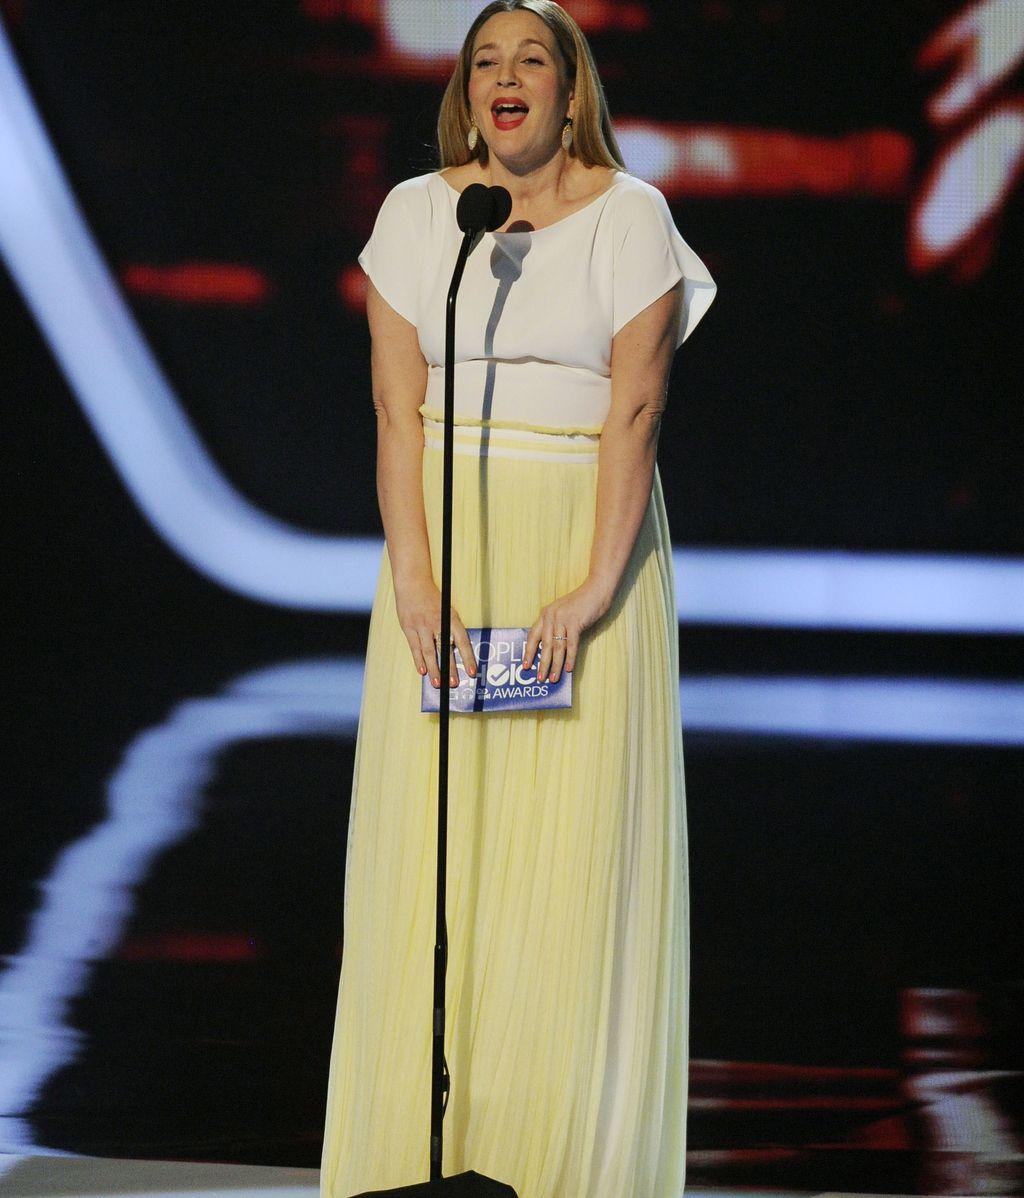 Sandra Bullock, triunfadora de los People's Choice Awards